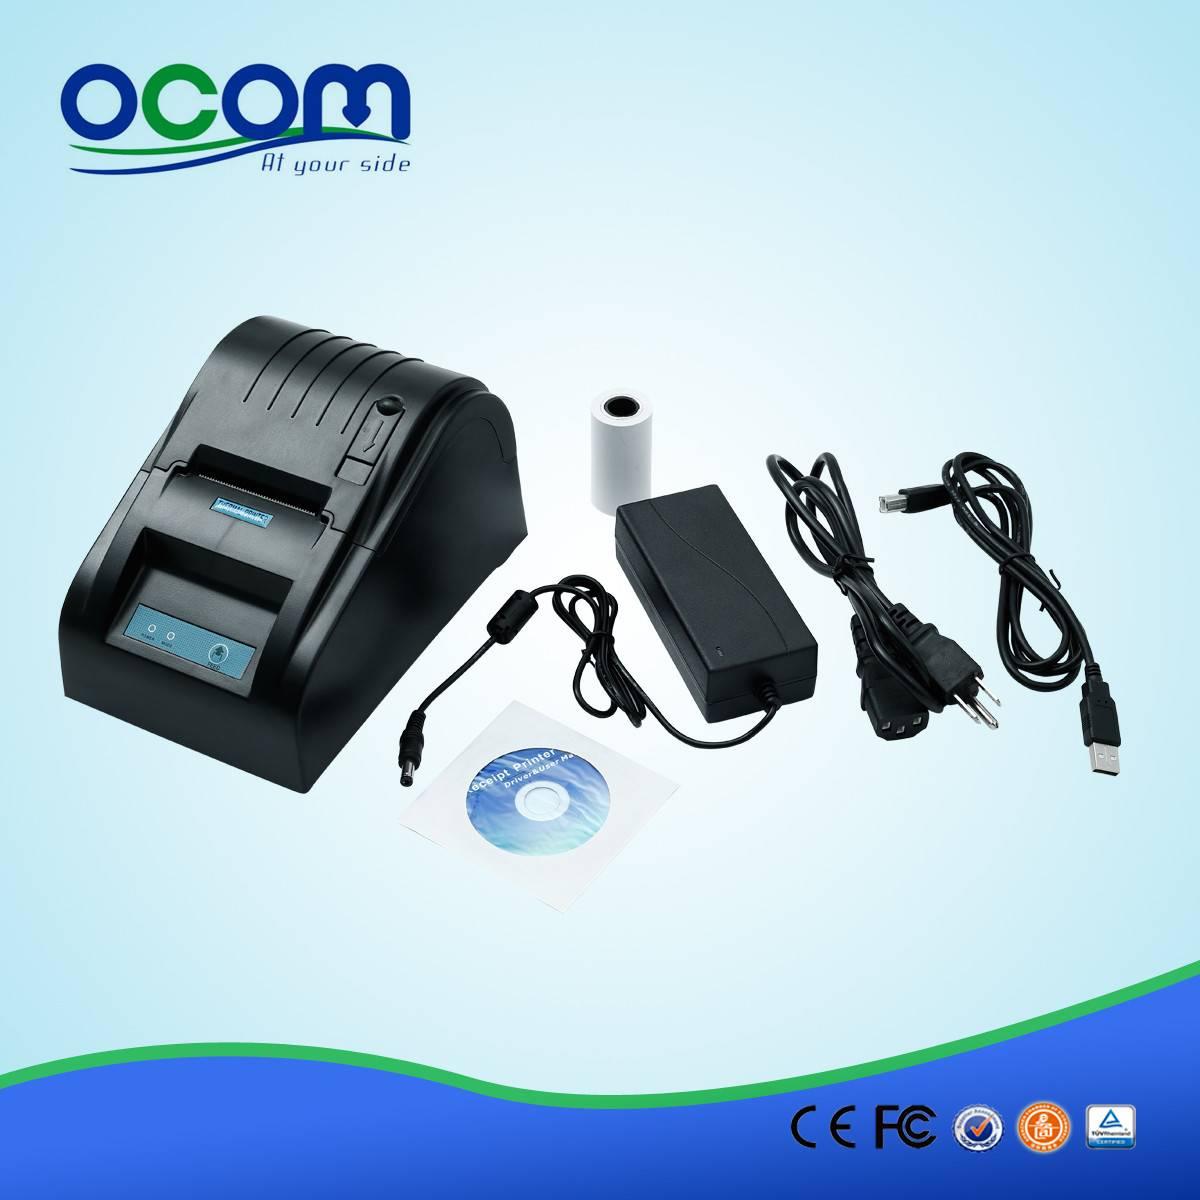 58mm thermal receipt printer for POS (OCPP-585)